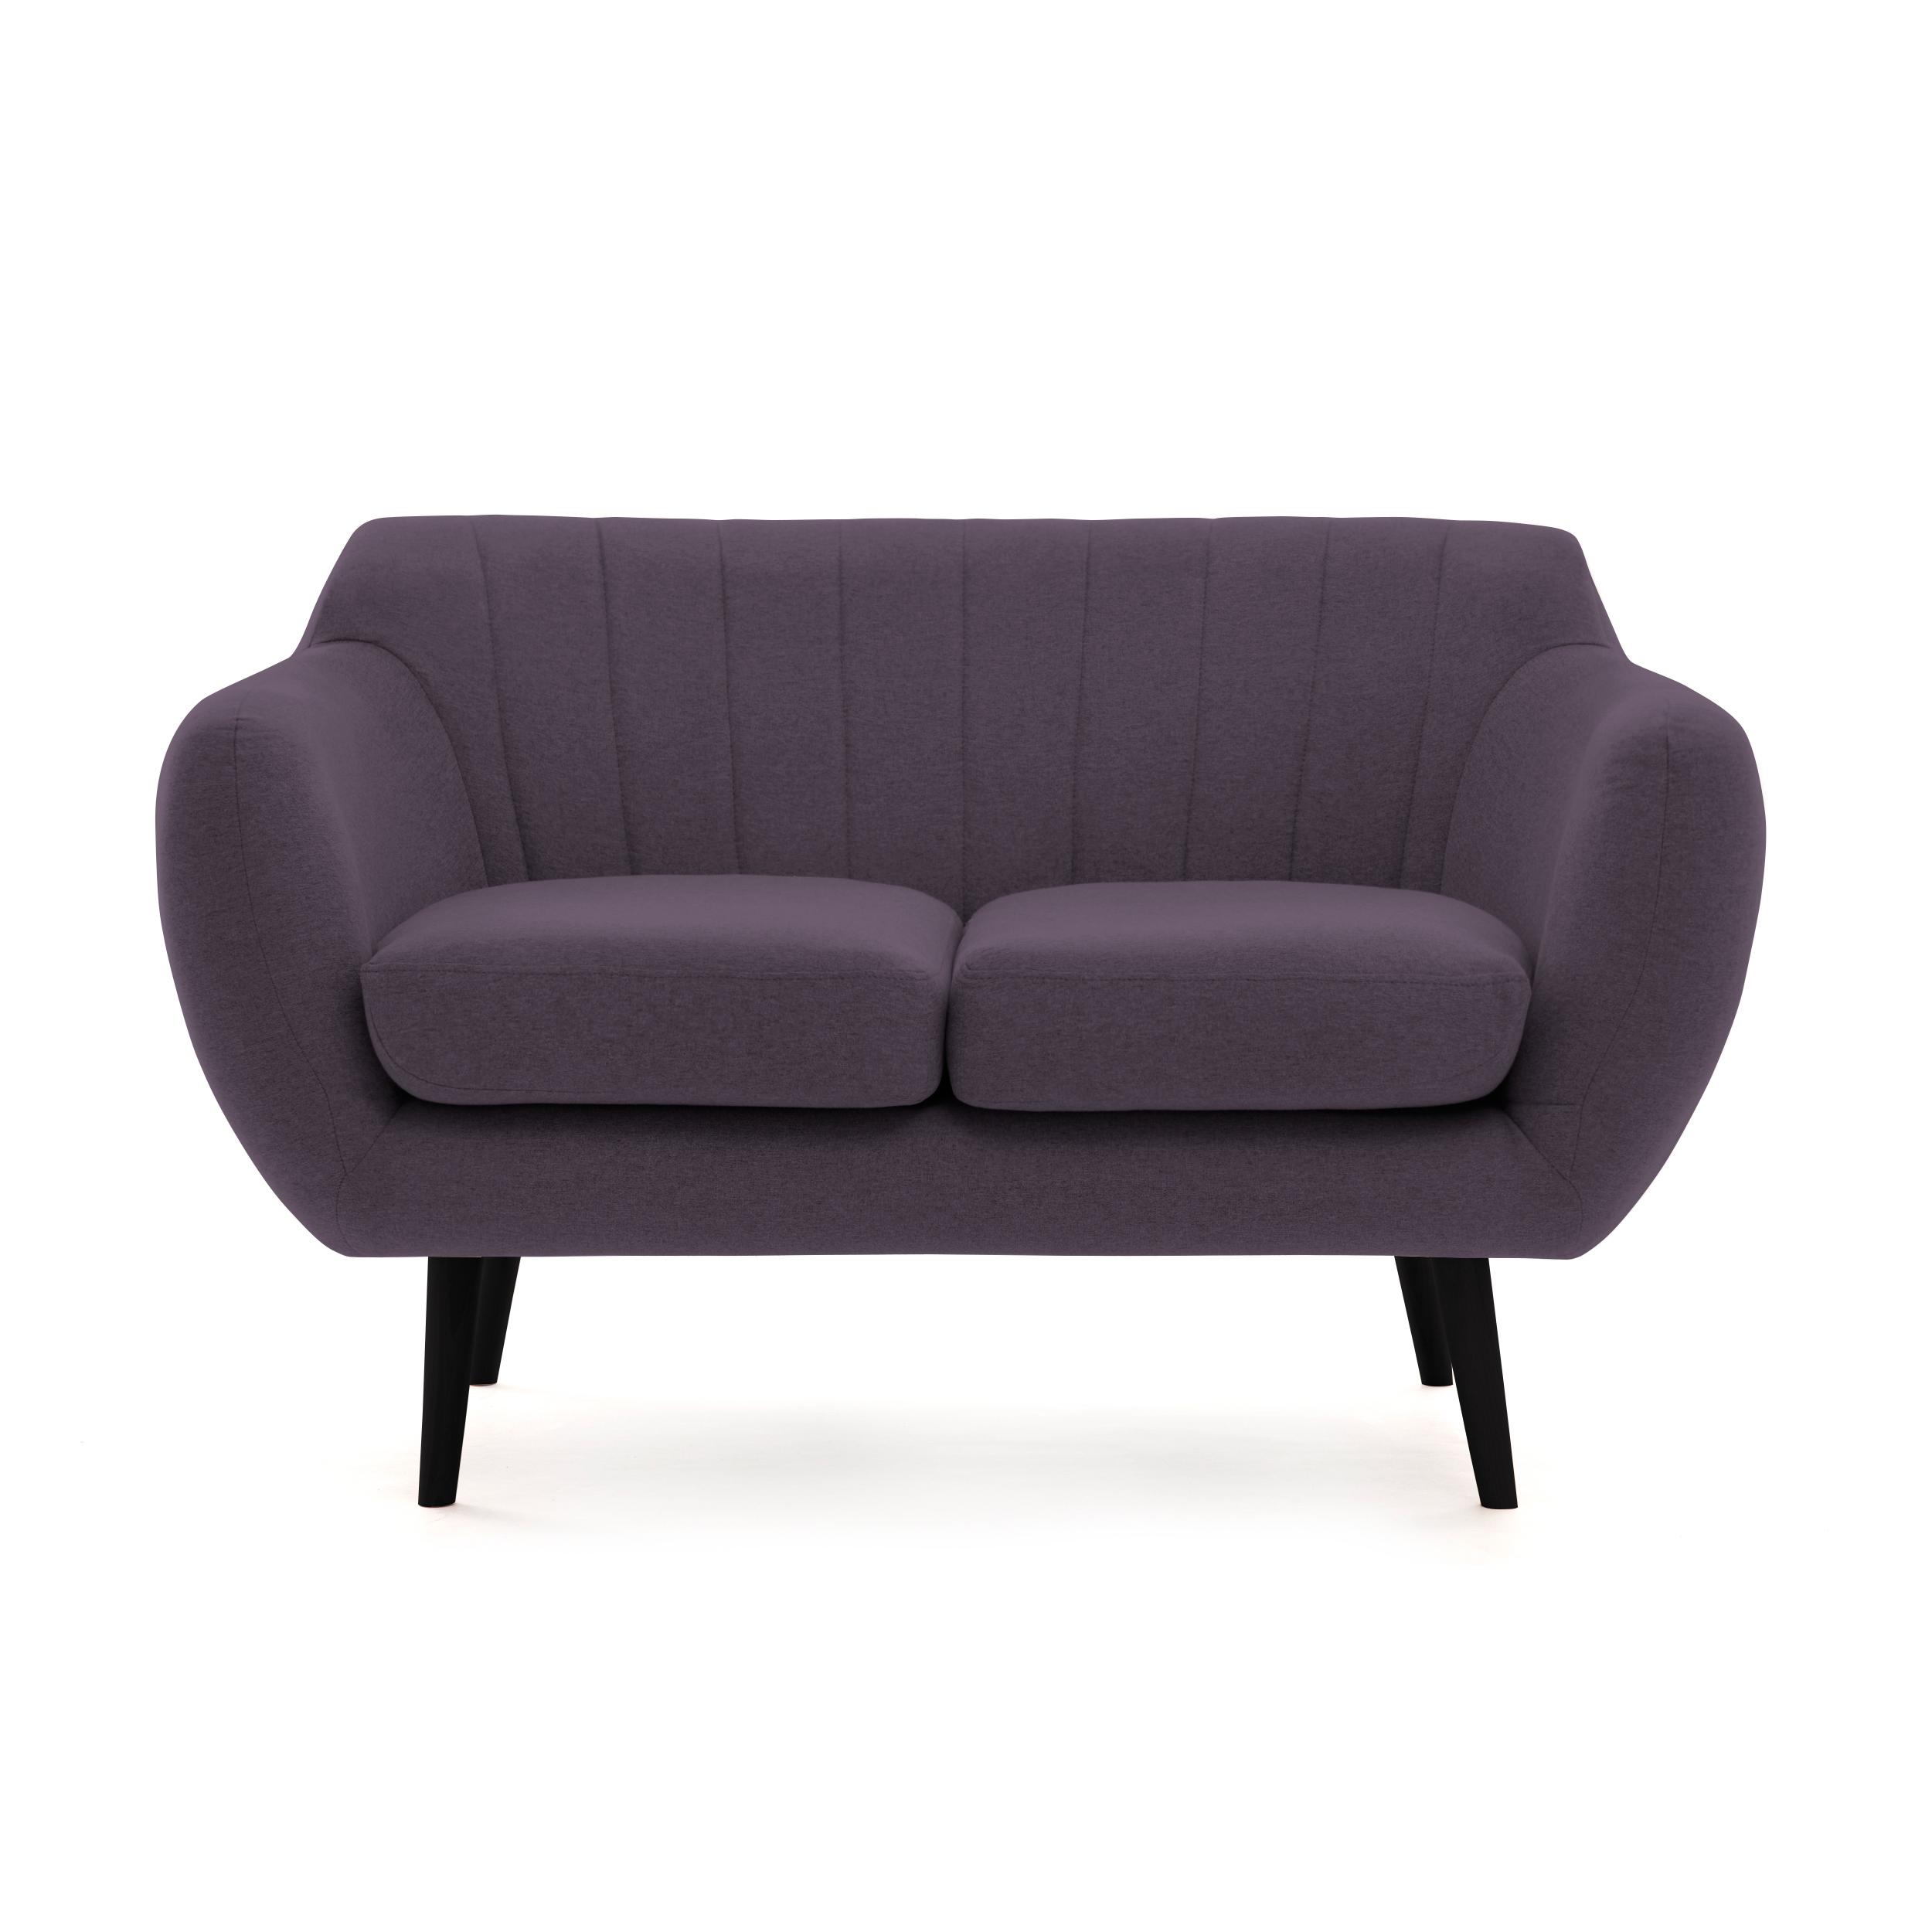 Canapea Fixa 2 locuri Kennet Aubergine II